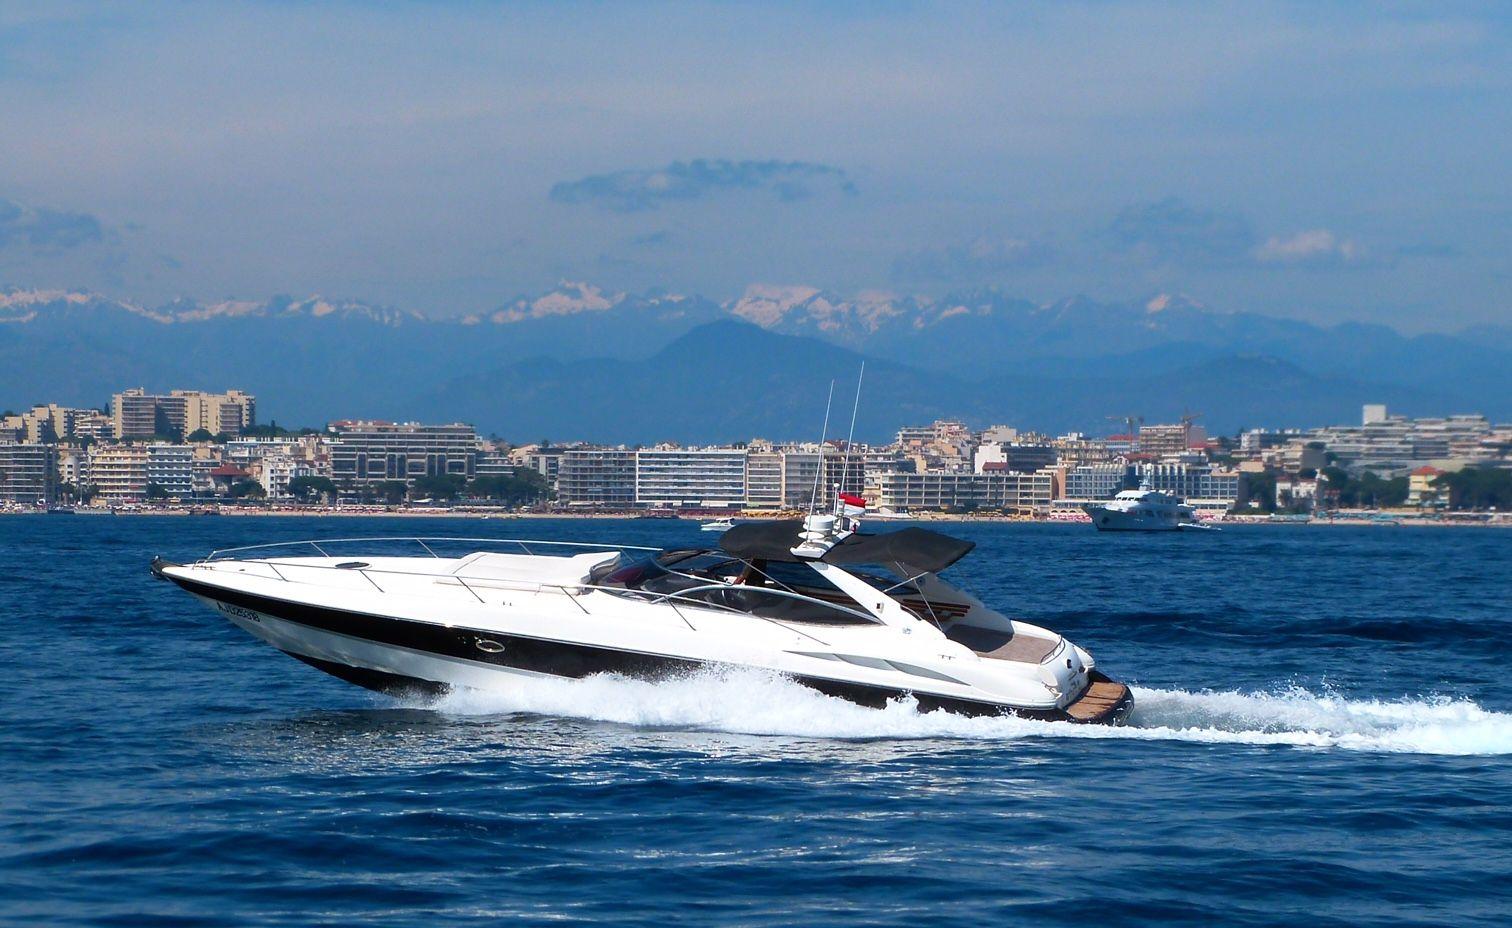 ARTHURO 3 - Sunseeker Superhawk 48 - Day Charter Yacht - Monaco - Cap D`Ail - Saint Jean Cap Ferrat